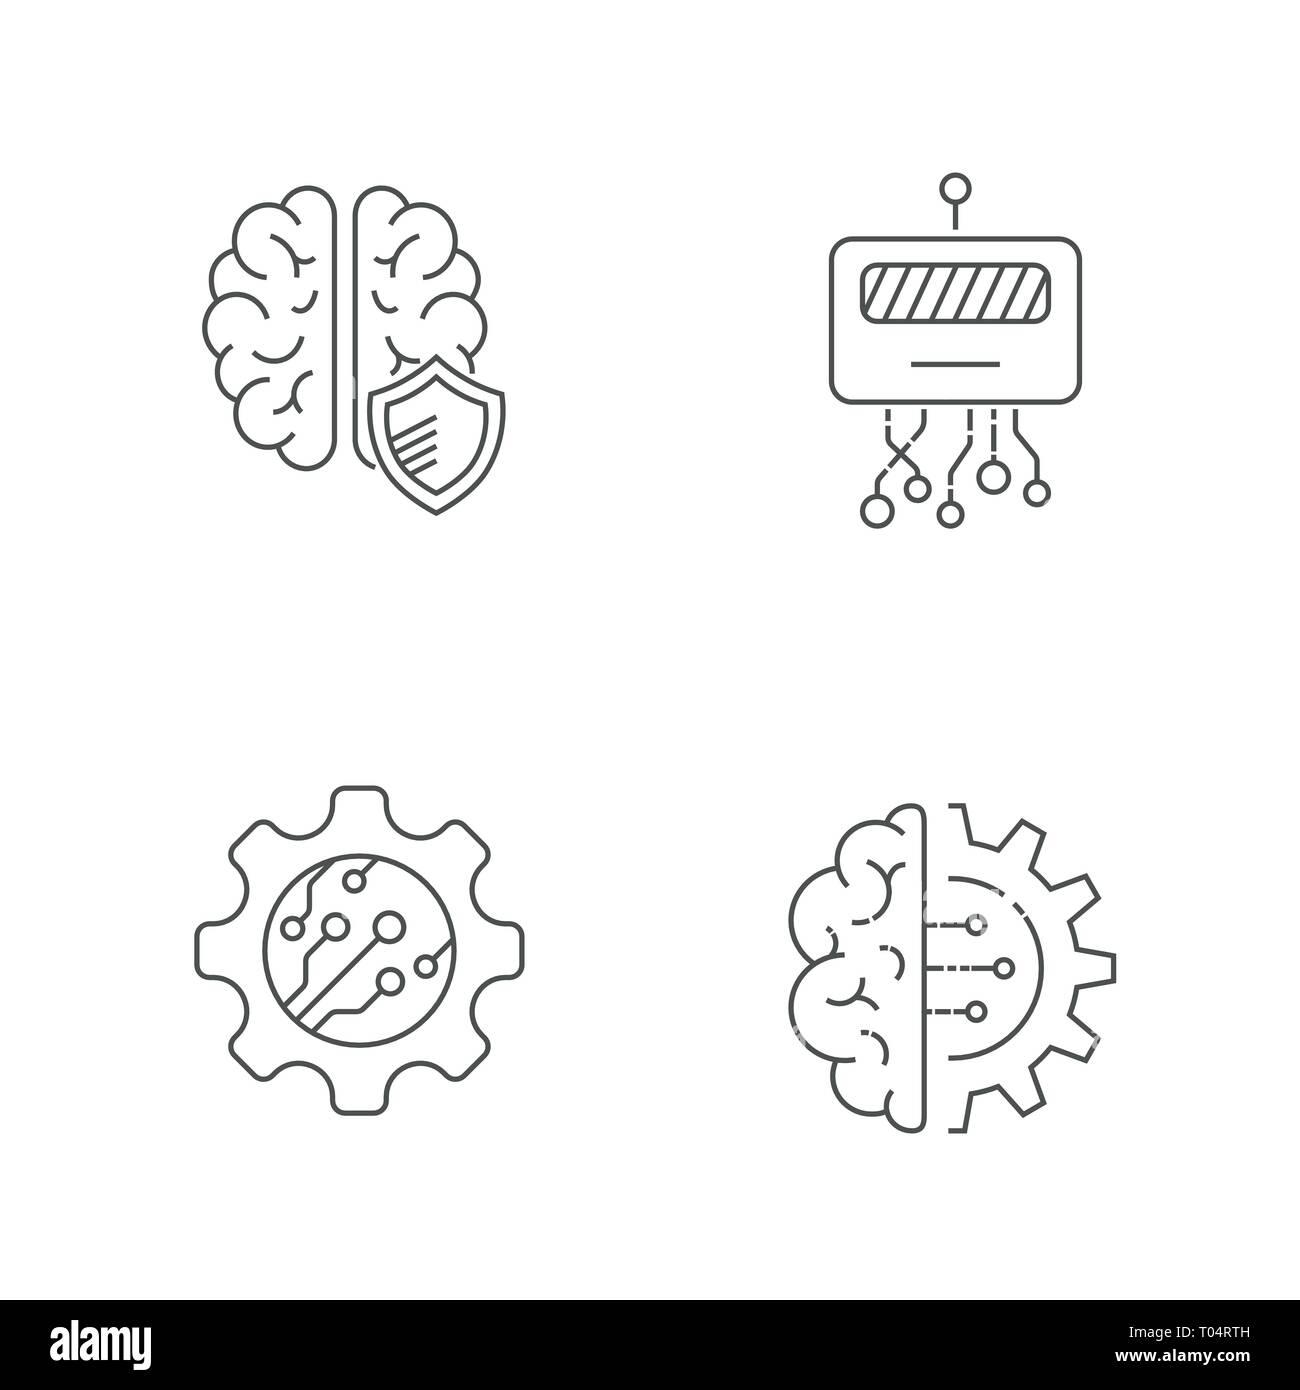 High computer technology. Hi-tech, AI, Iot, Indystry 4.0. Editable Stroke. EPS 10 - Stock Image